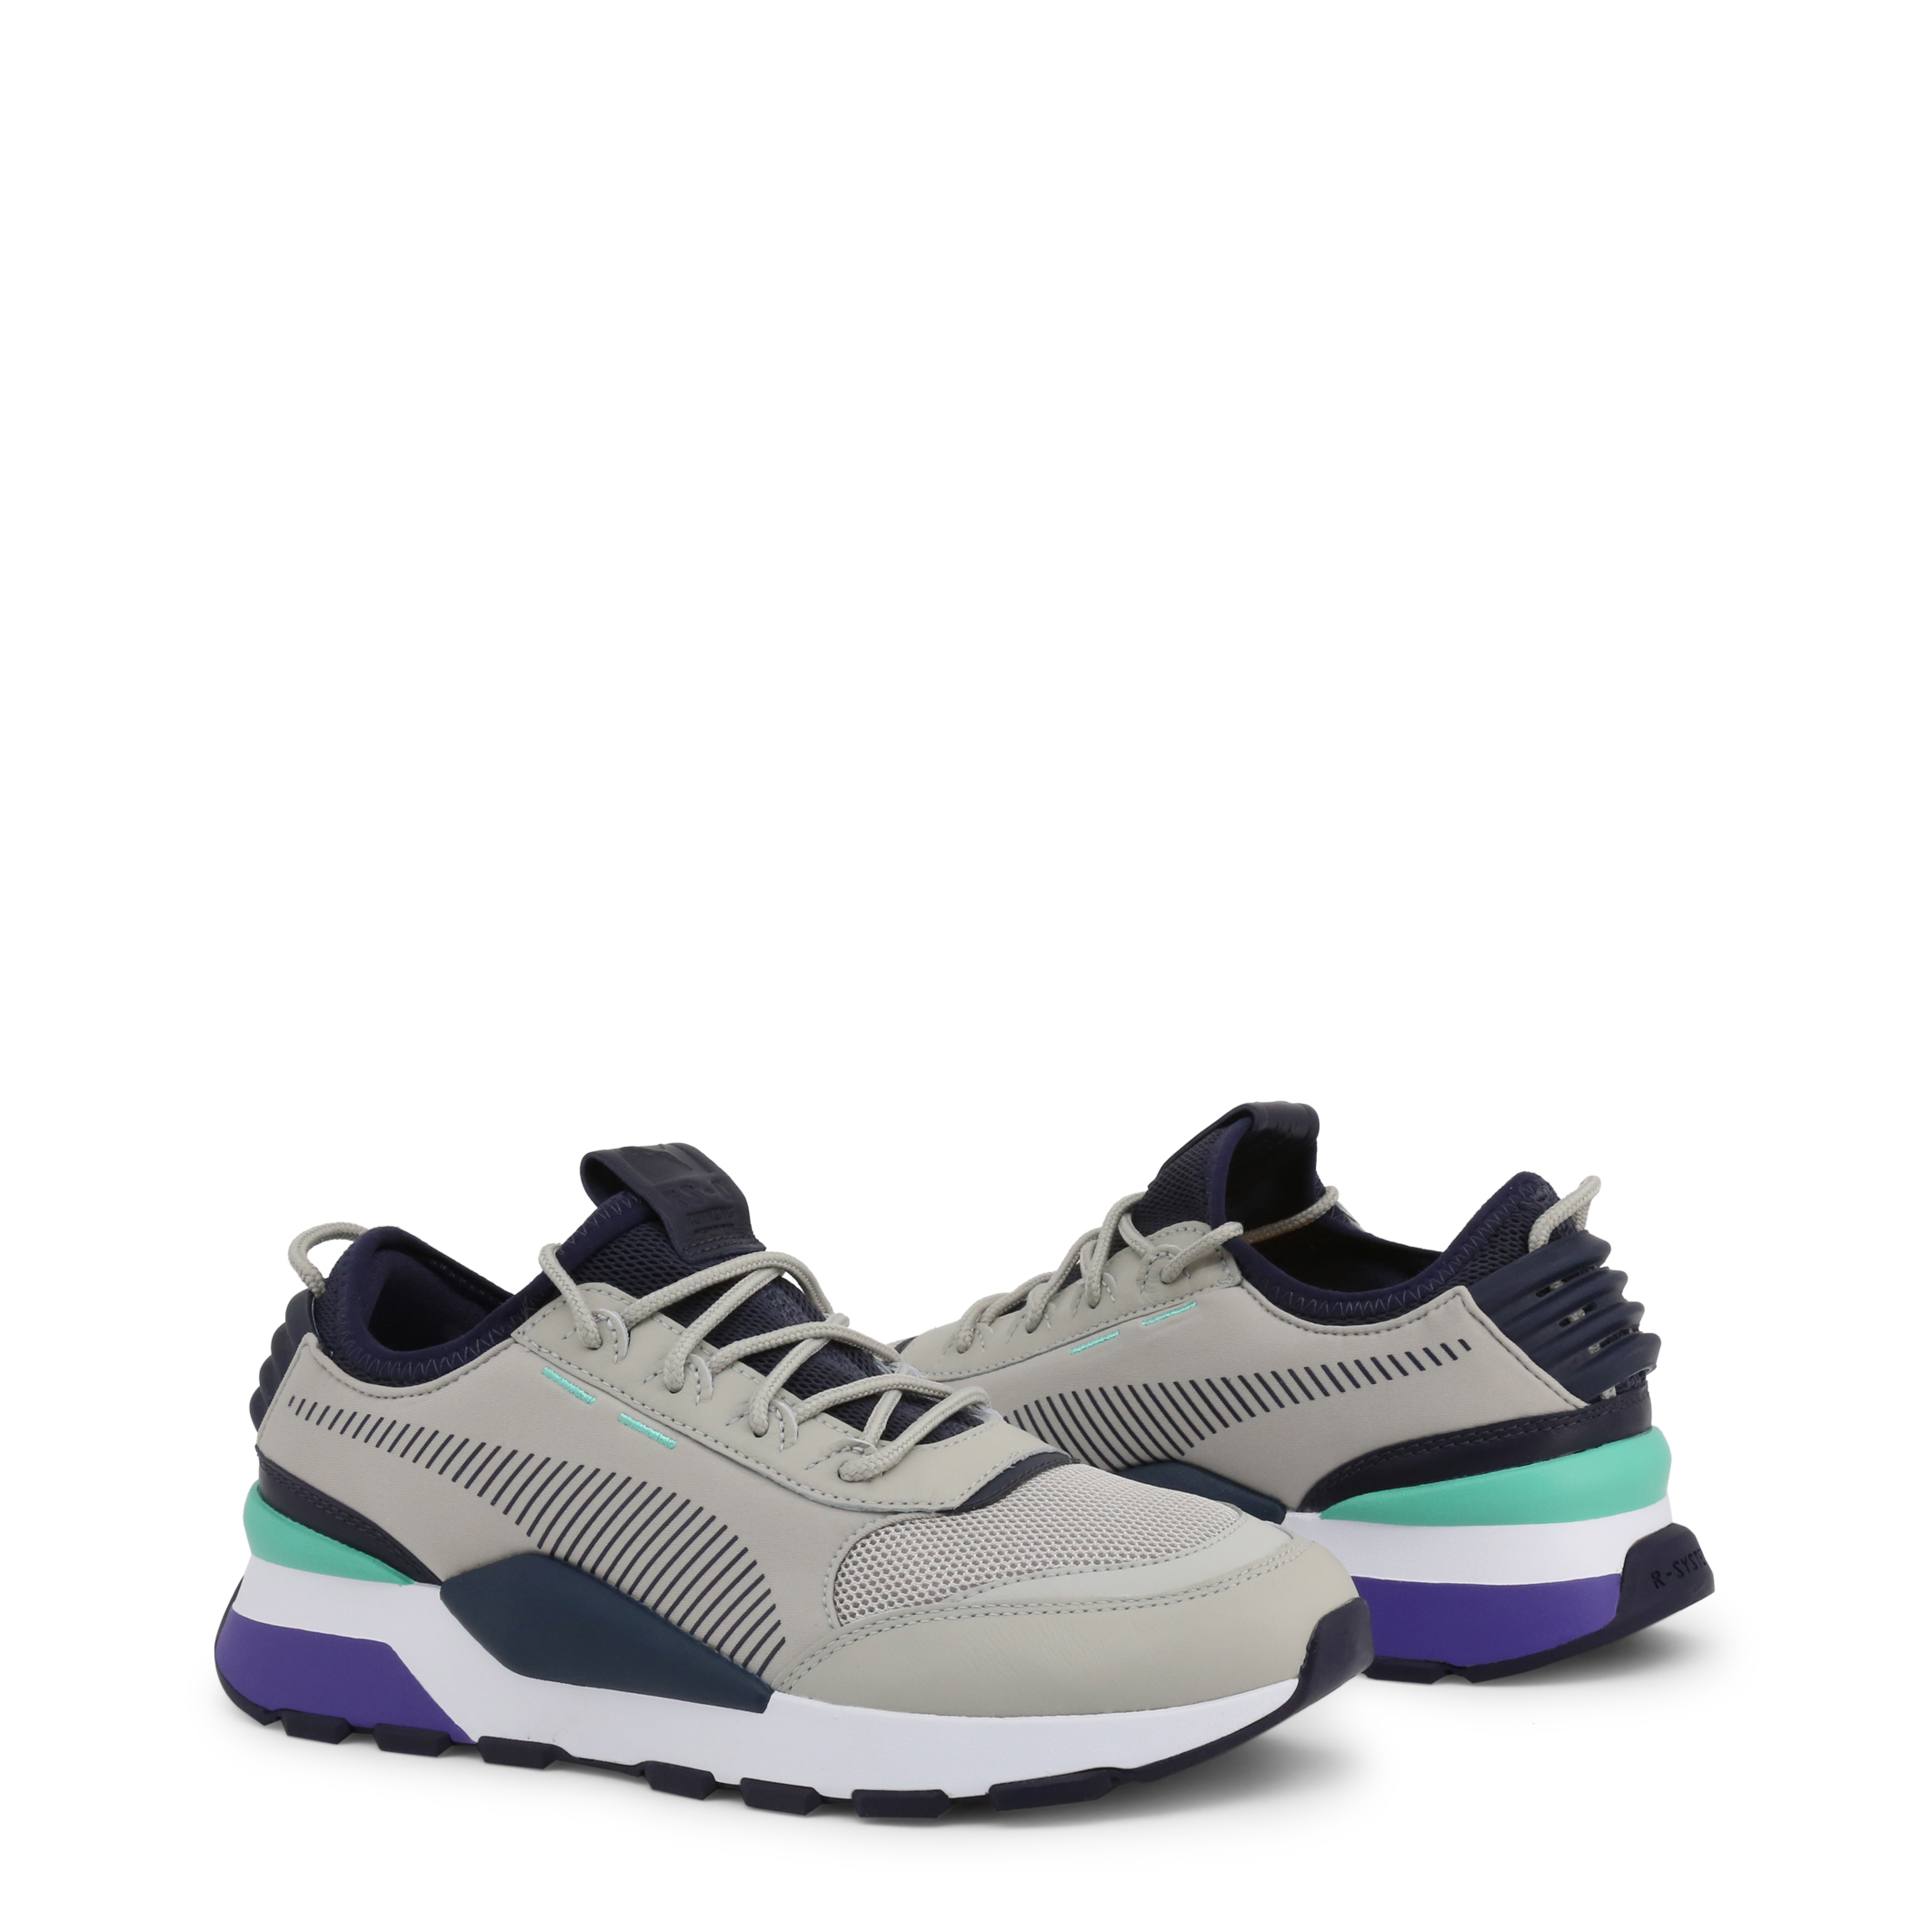 Baskets / Sport  Puma 369362-02-Tracks grey